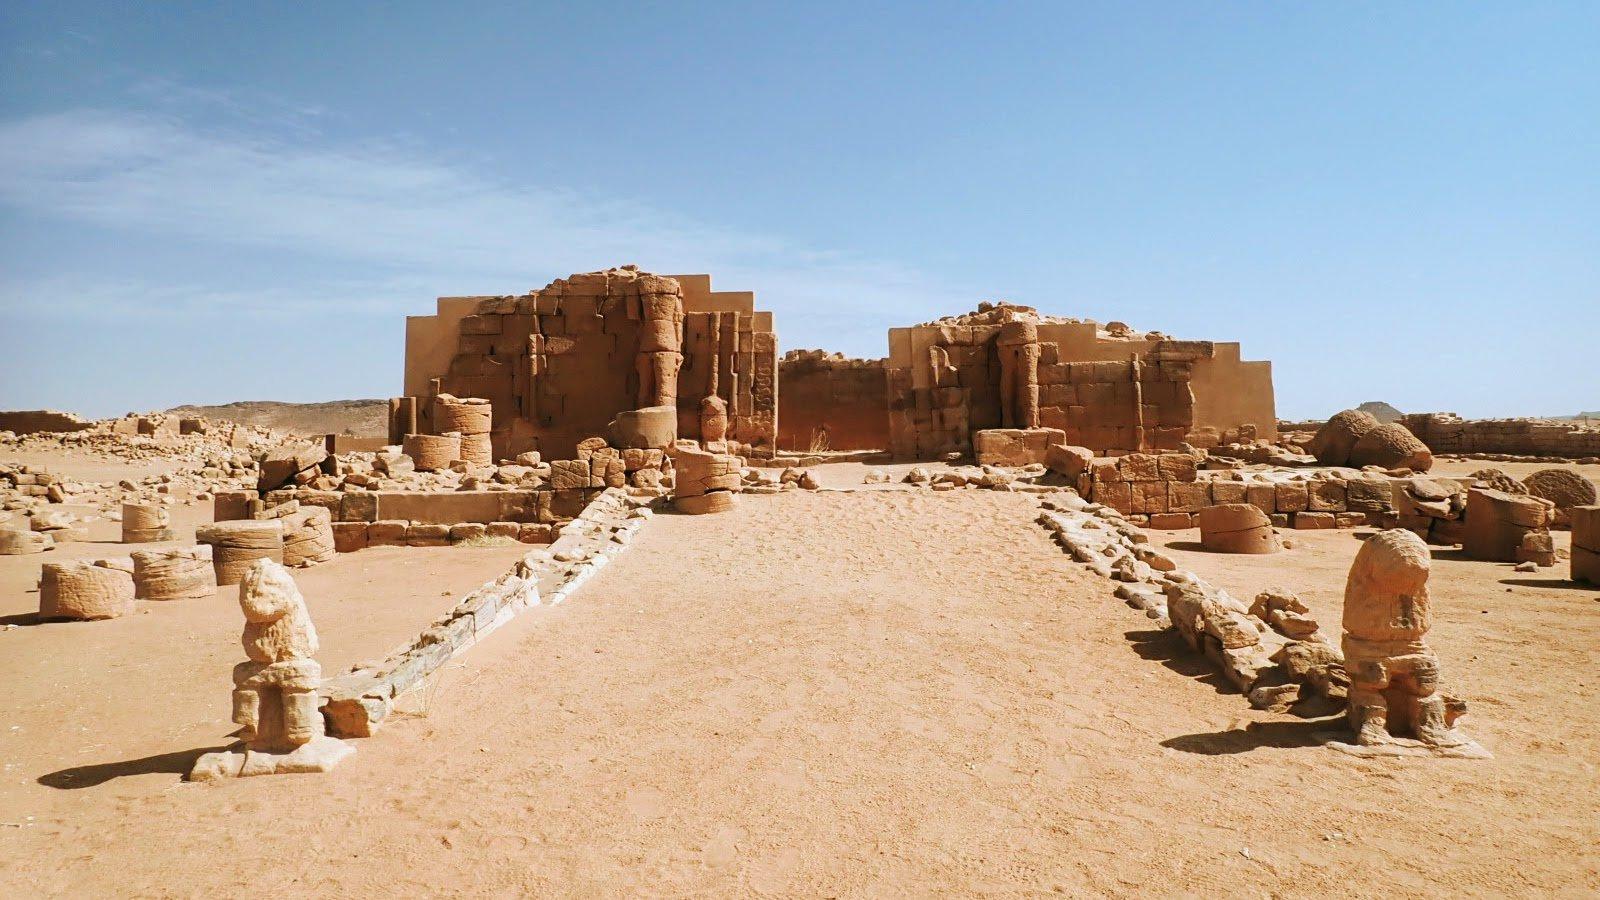 Ruined temple enclosure in Sudan